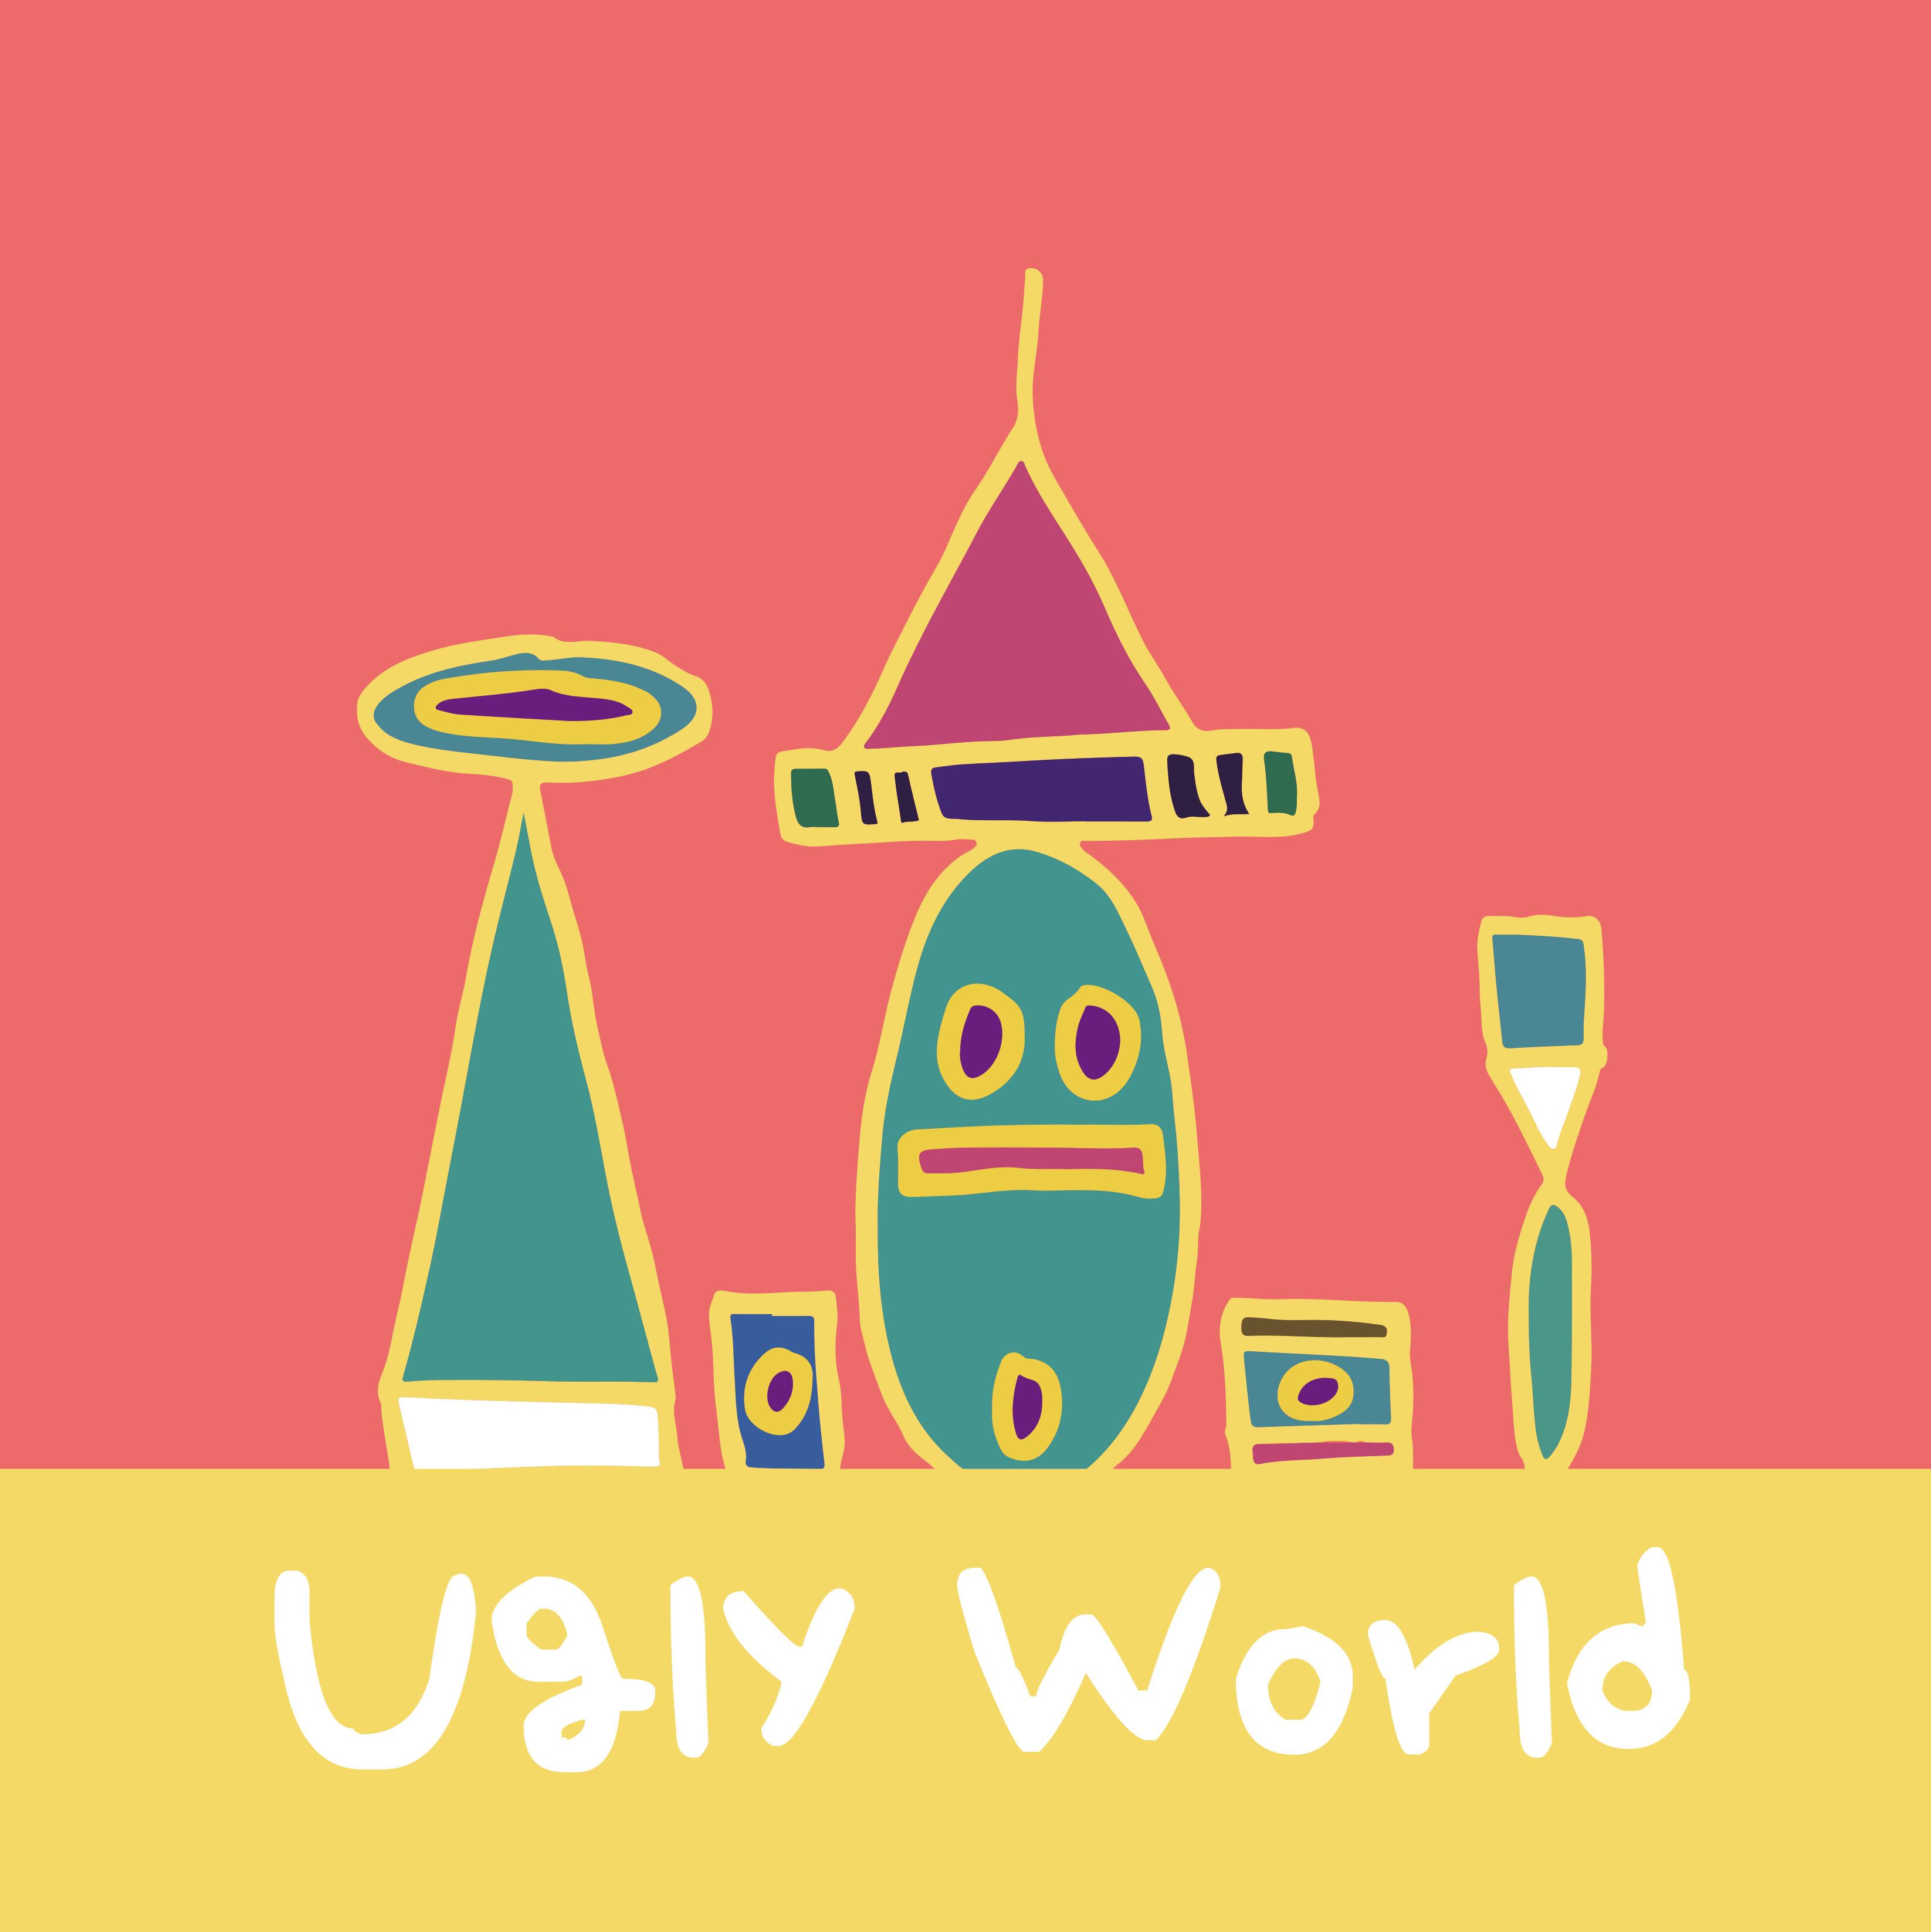 JUIEE UglyWorld